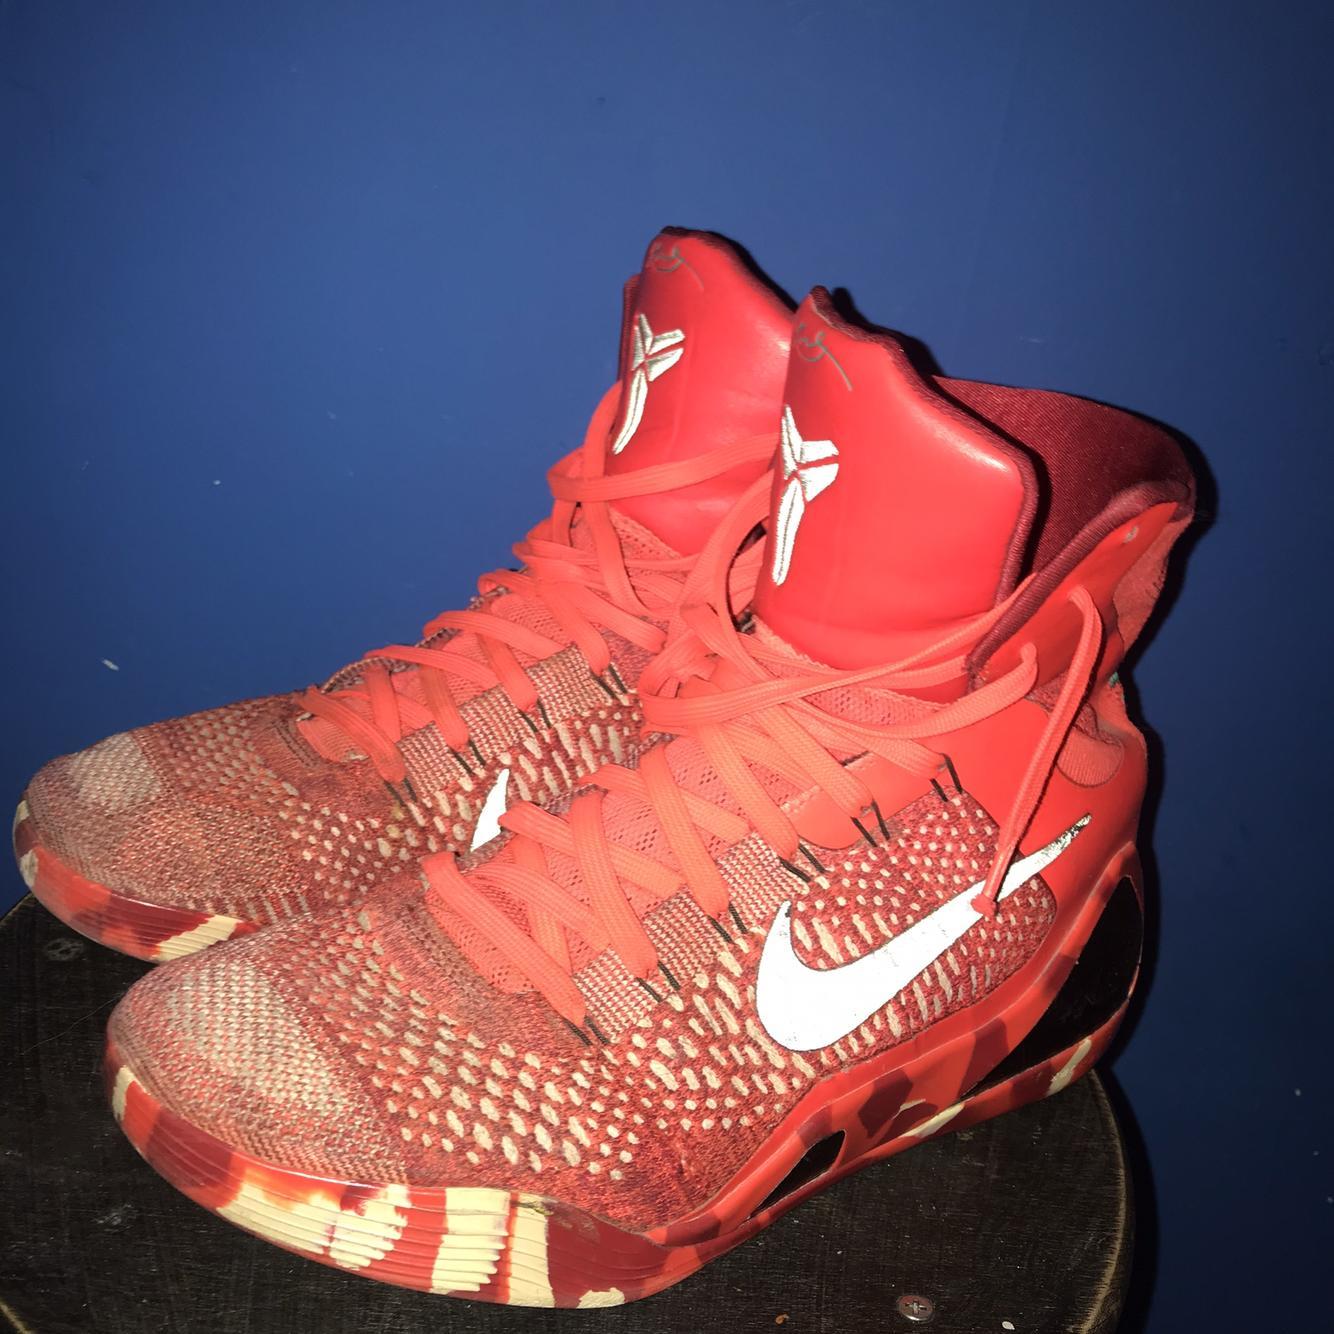 Nike Kobe 9 Elite High Christmas Used